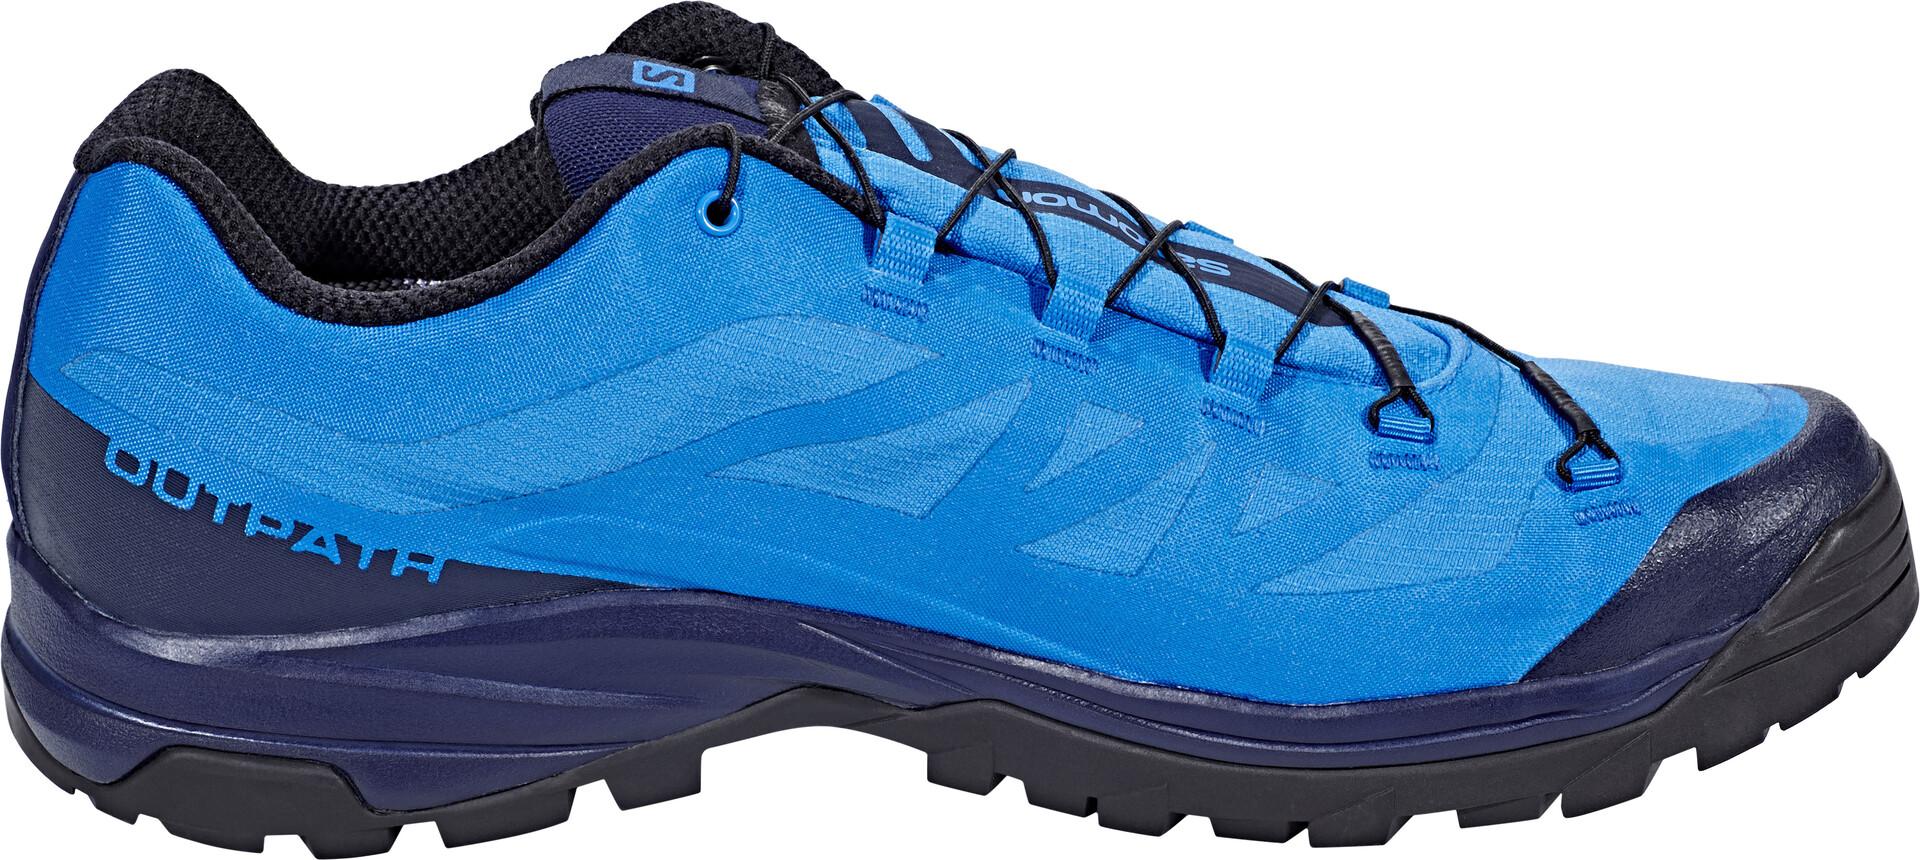 Salomon Outpath Homme sur CAMPZ bleu GTX Chaussures wOZ08XNPkn